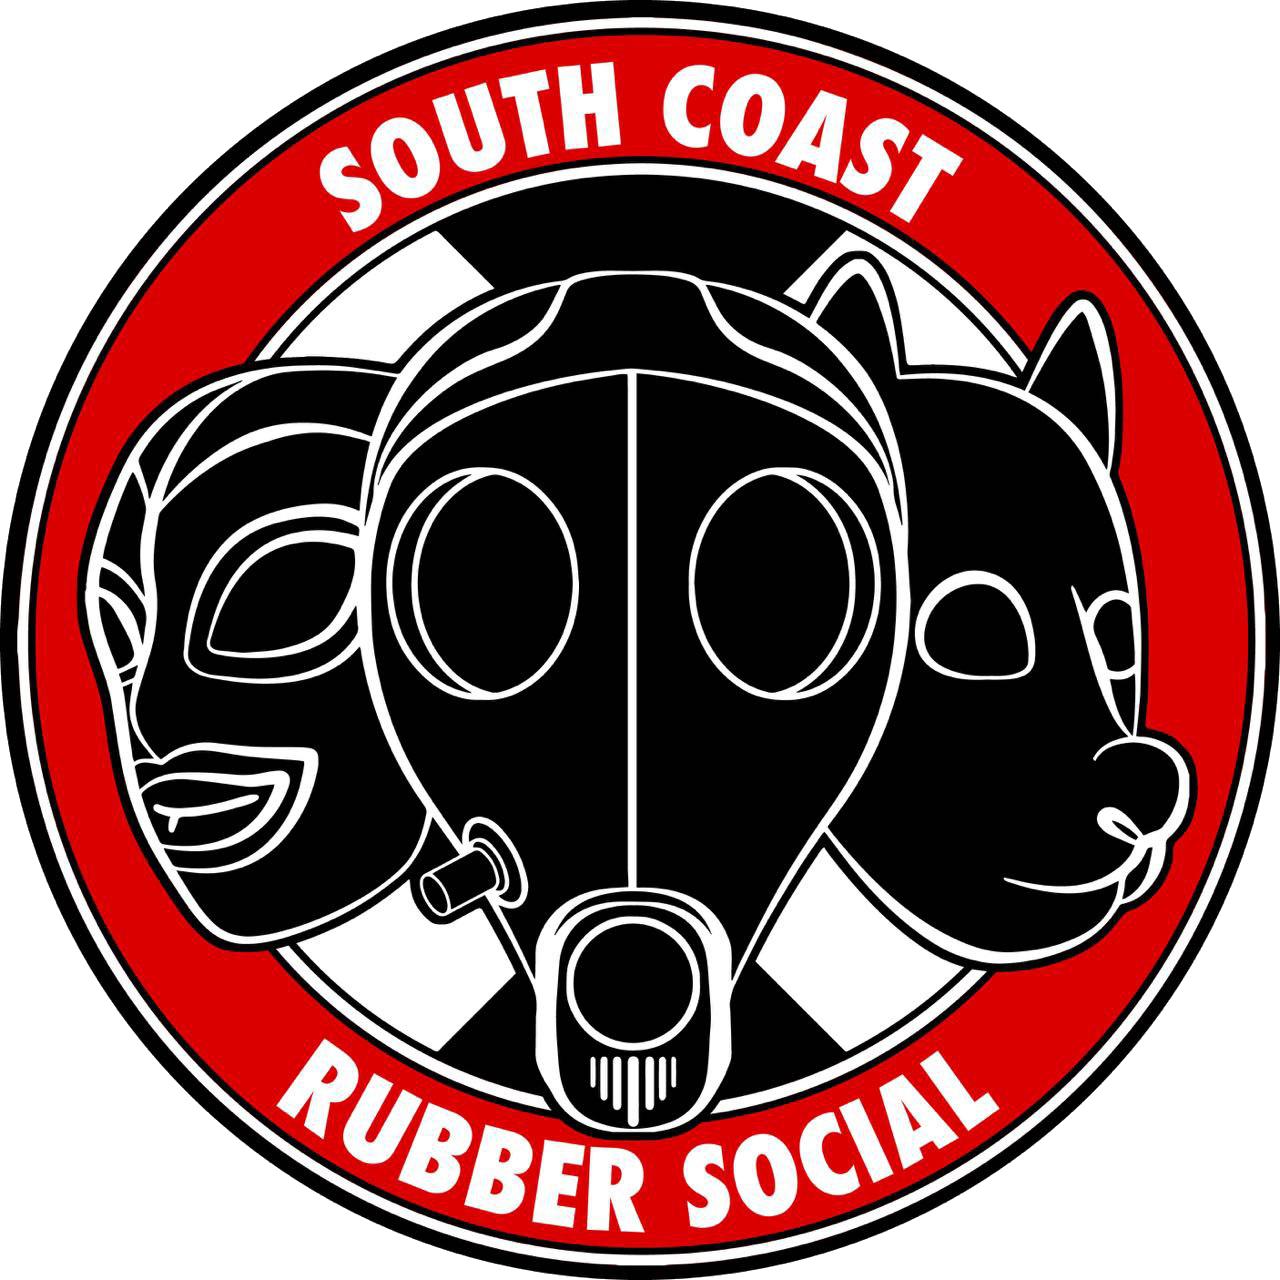 Rubber Social